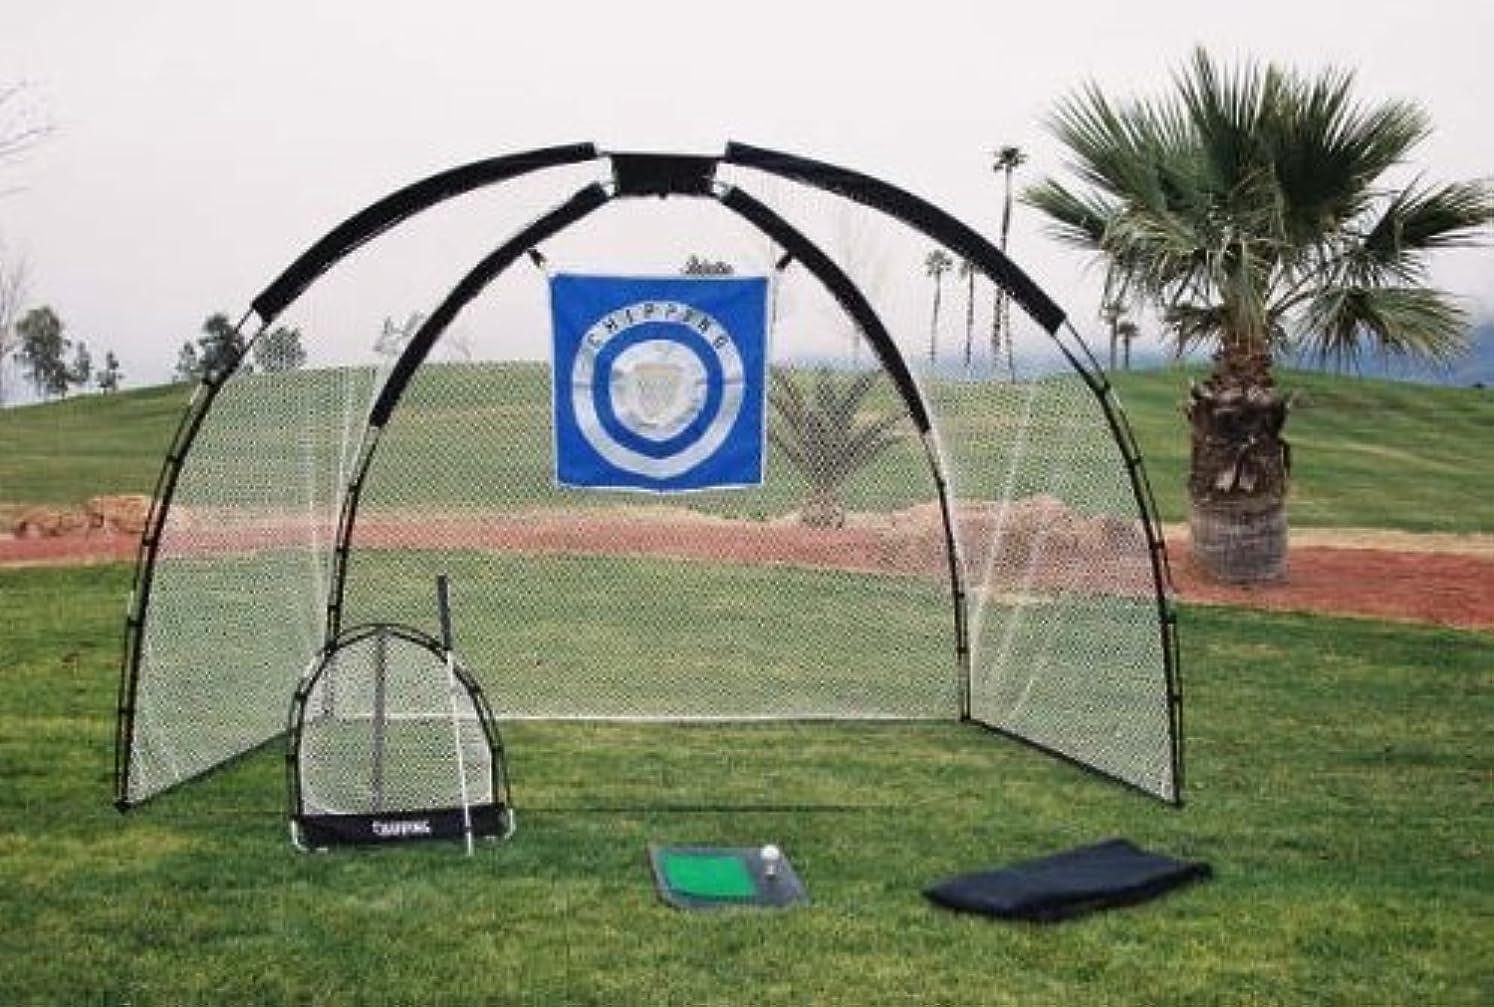 3 in 1 Golf Practice Set xdirjoecp6612093